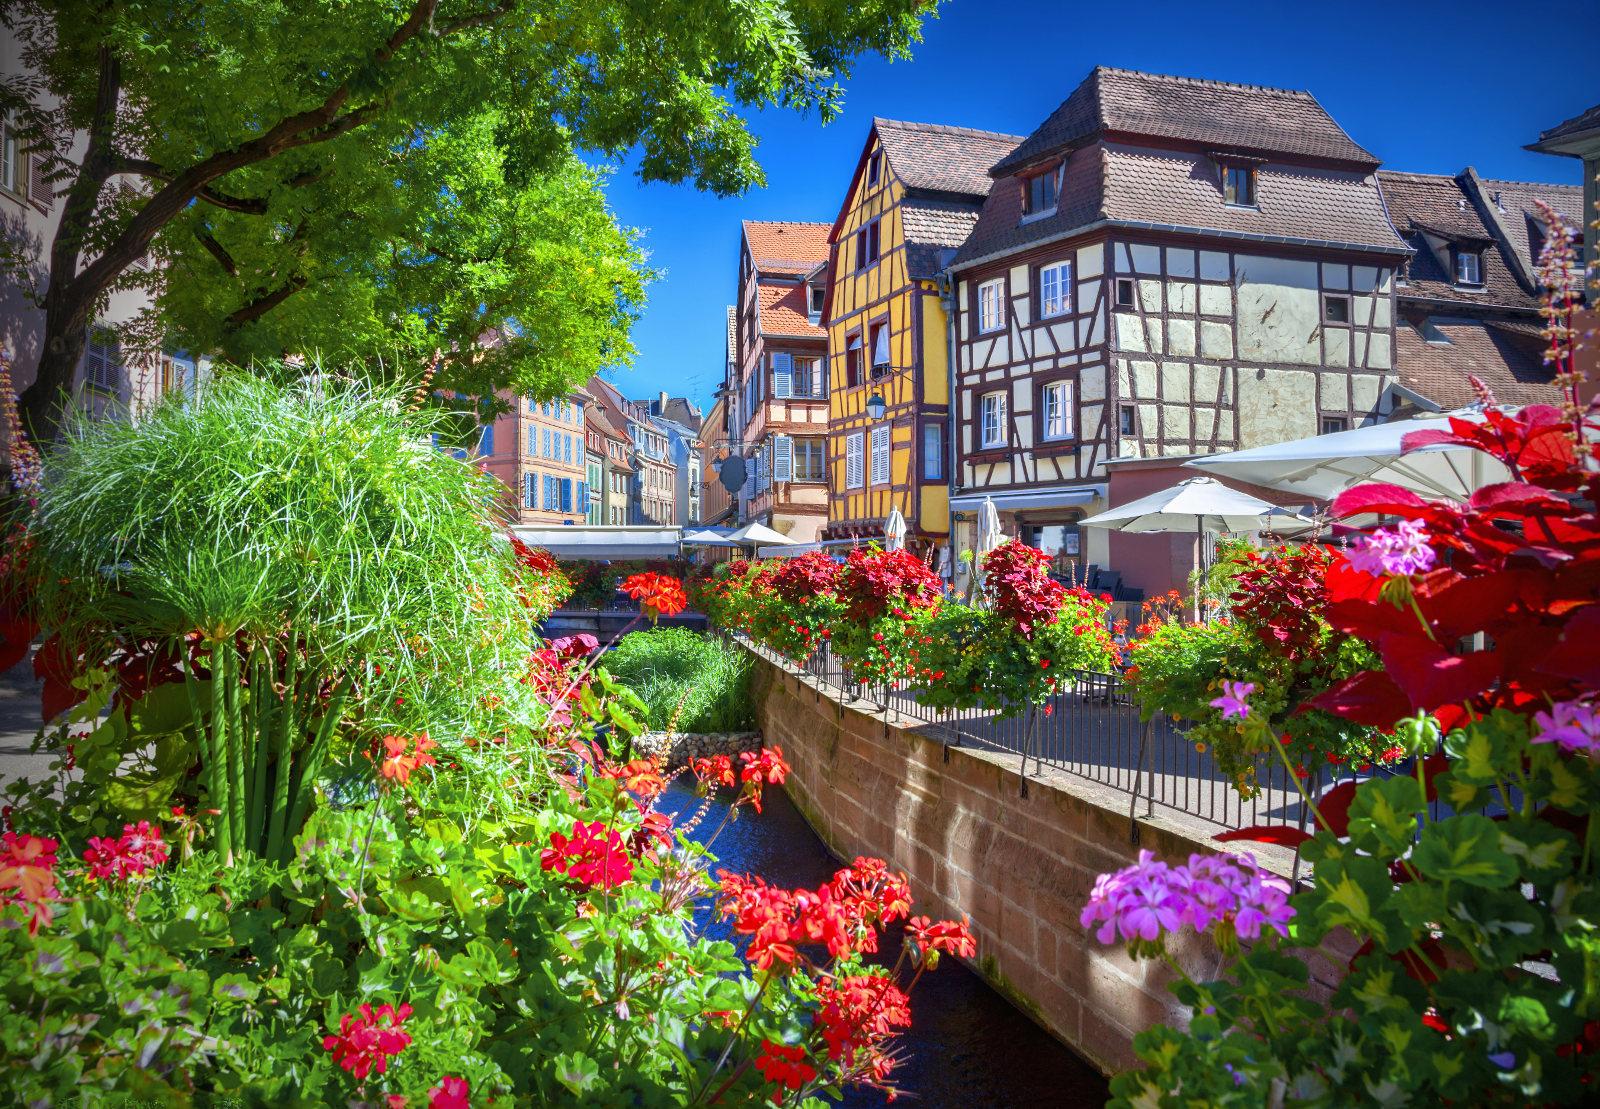 https://apps.tourisme-alsace.info/photos/essais/photos/302000730_1.jpg